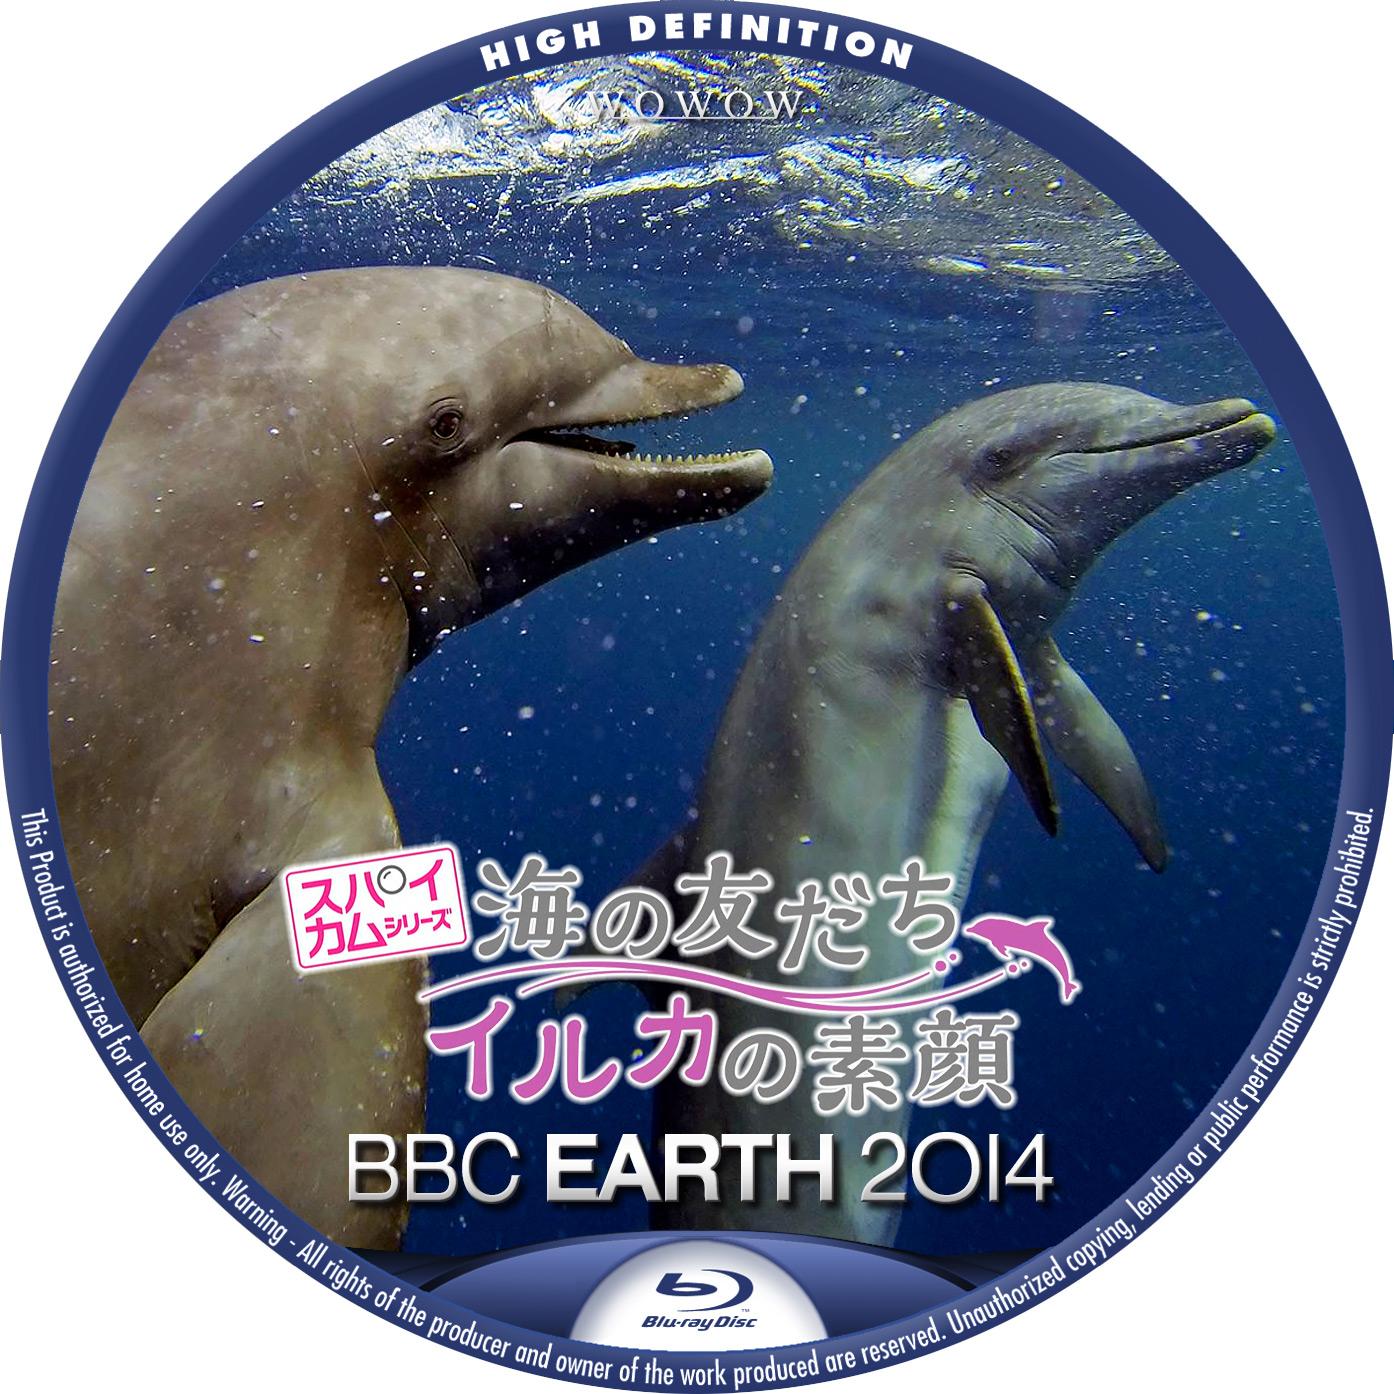 BBC EARTH 2014 スパイカム 海の友だち イルカの素顔 BDラベル Blu-ray